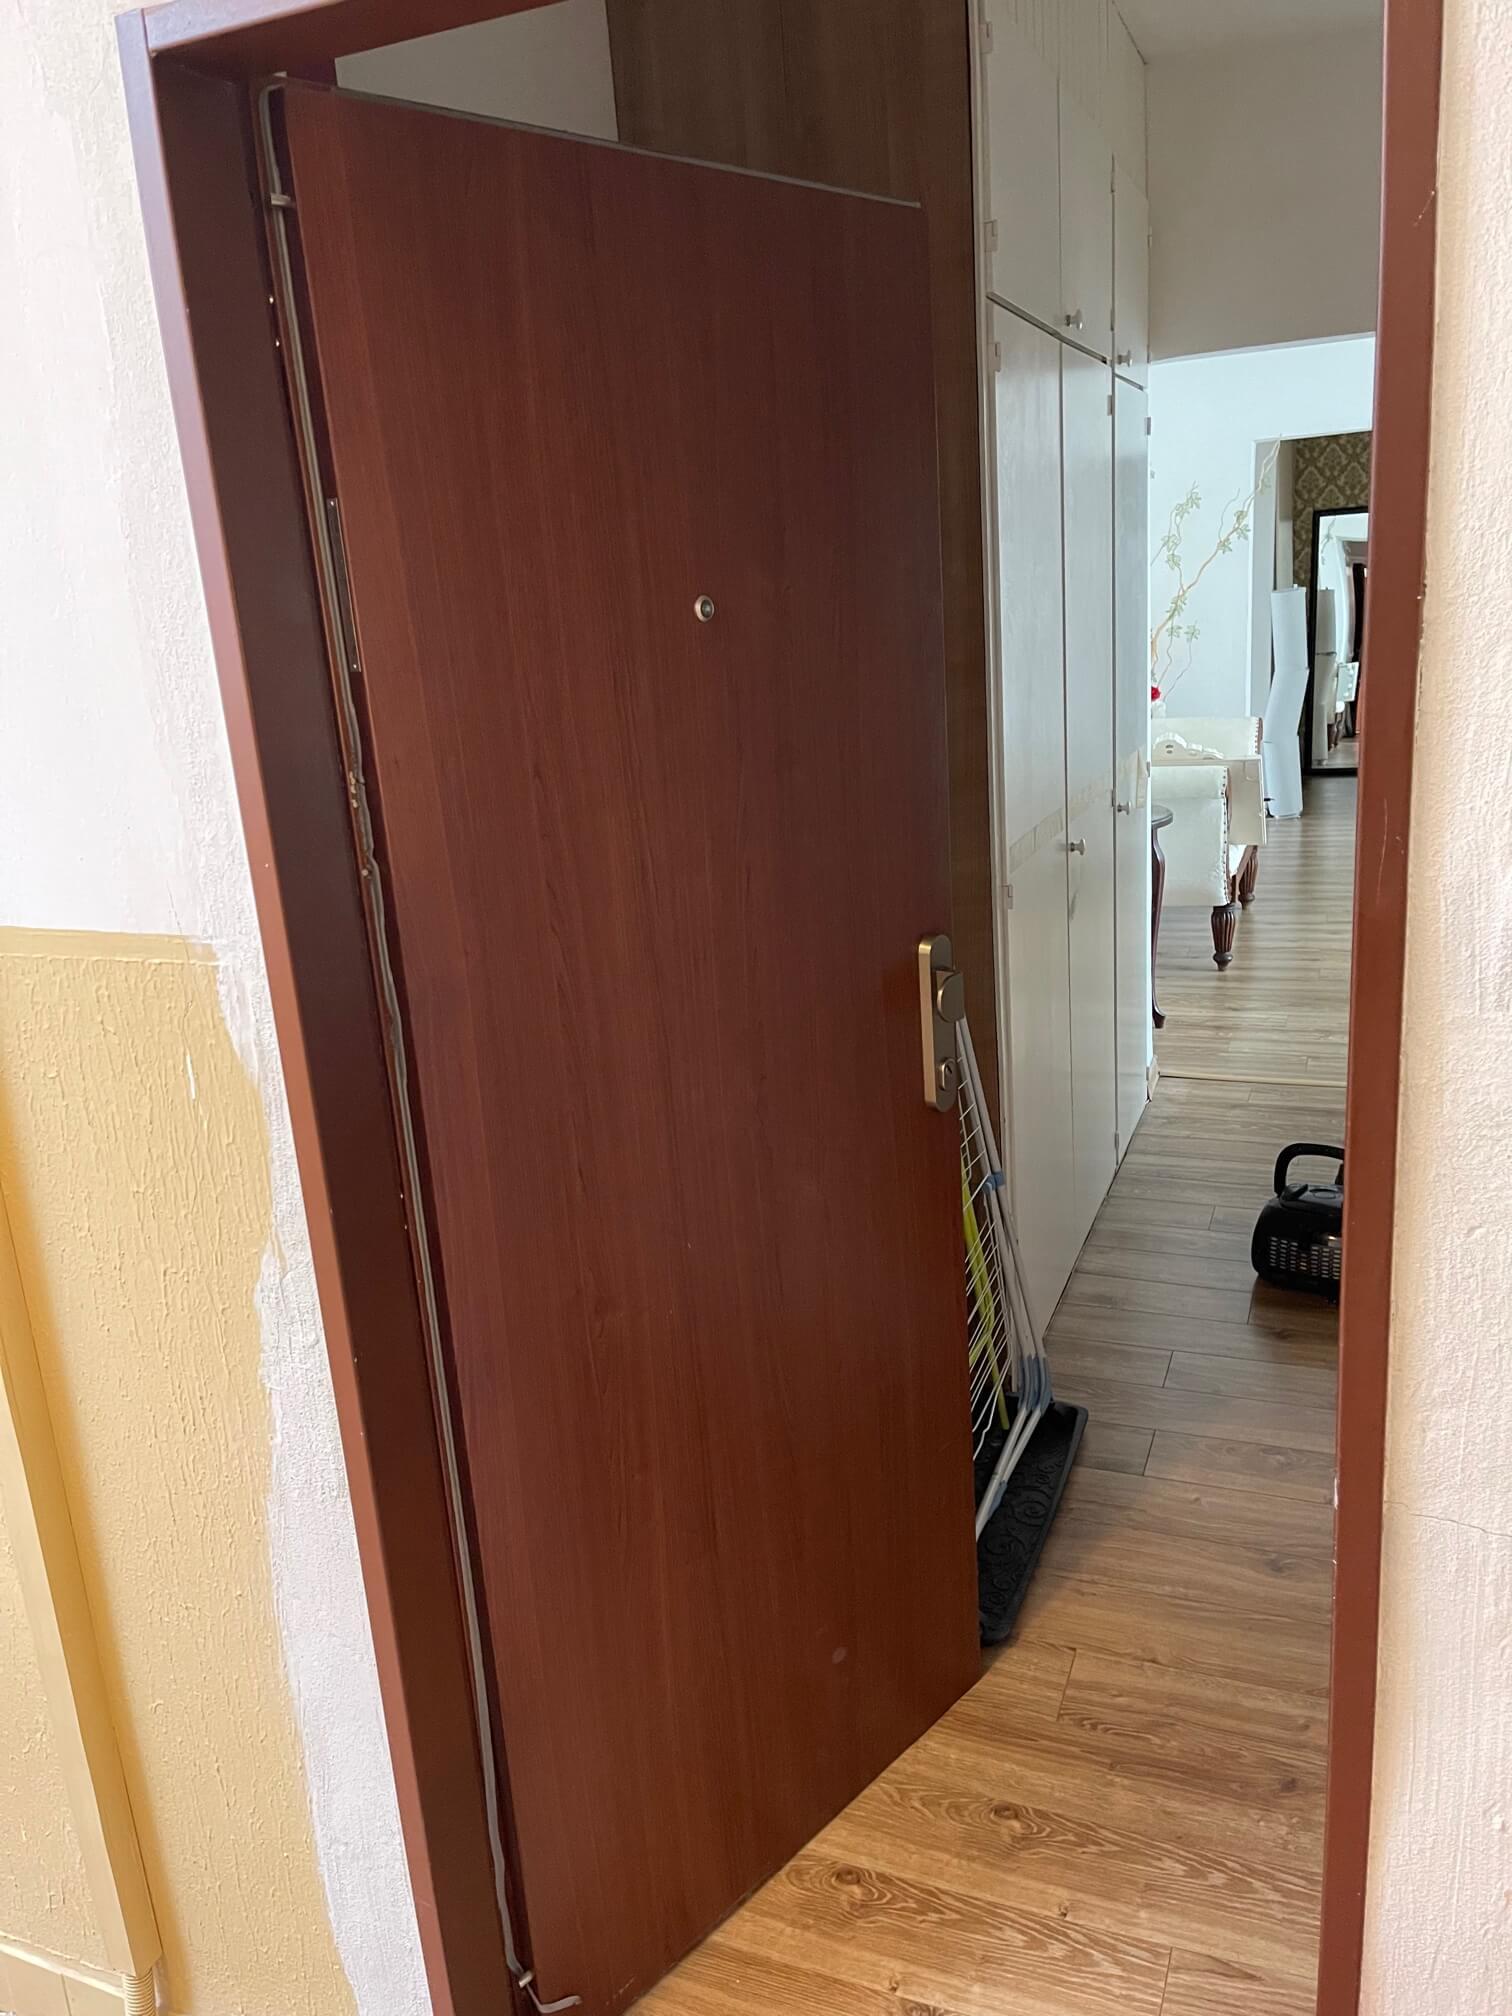 Exkluzívne na prenájom 3 izbový byt, 83m2, 2x loggia 4,5m2, Karolovka, Janotová 8-23